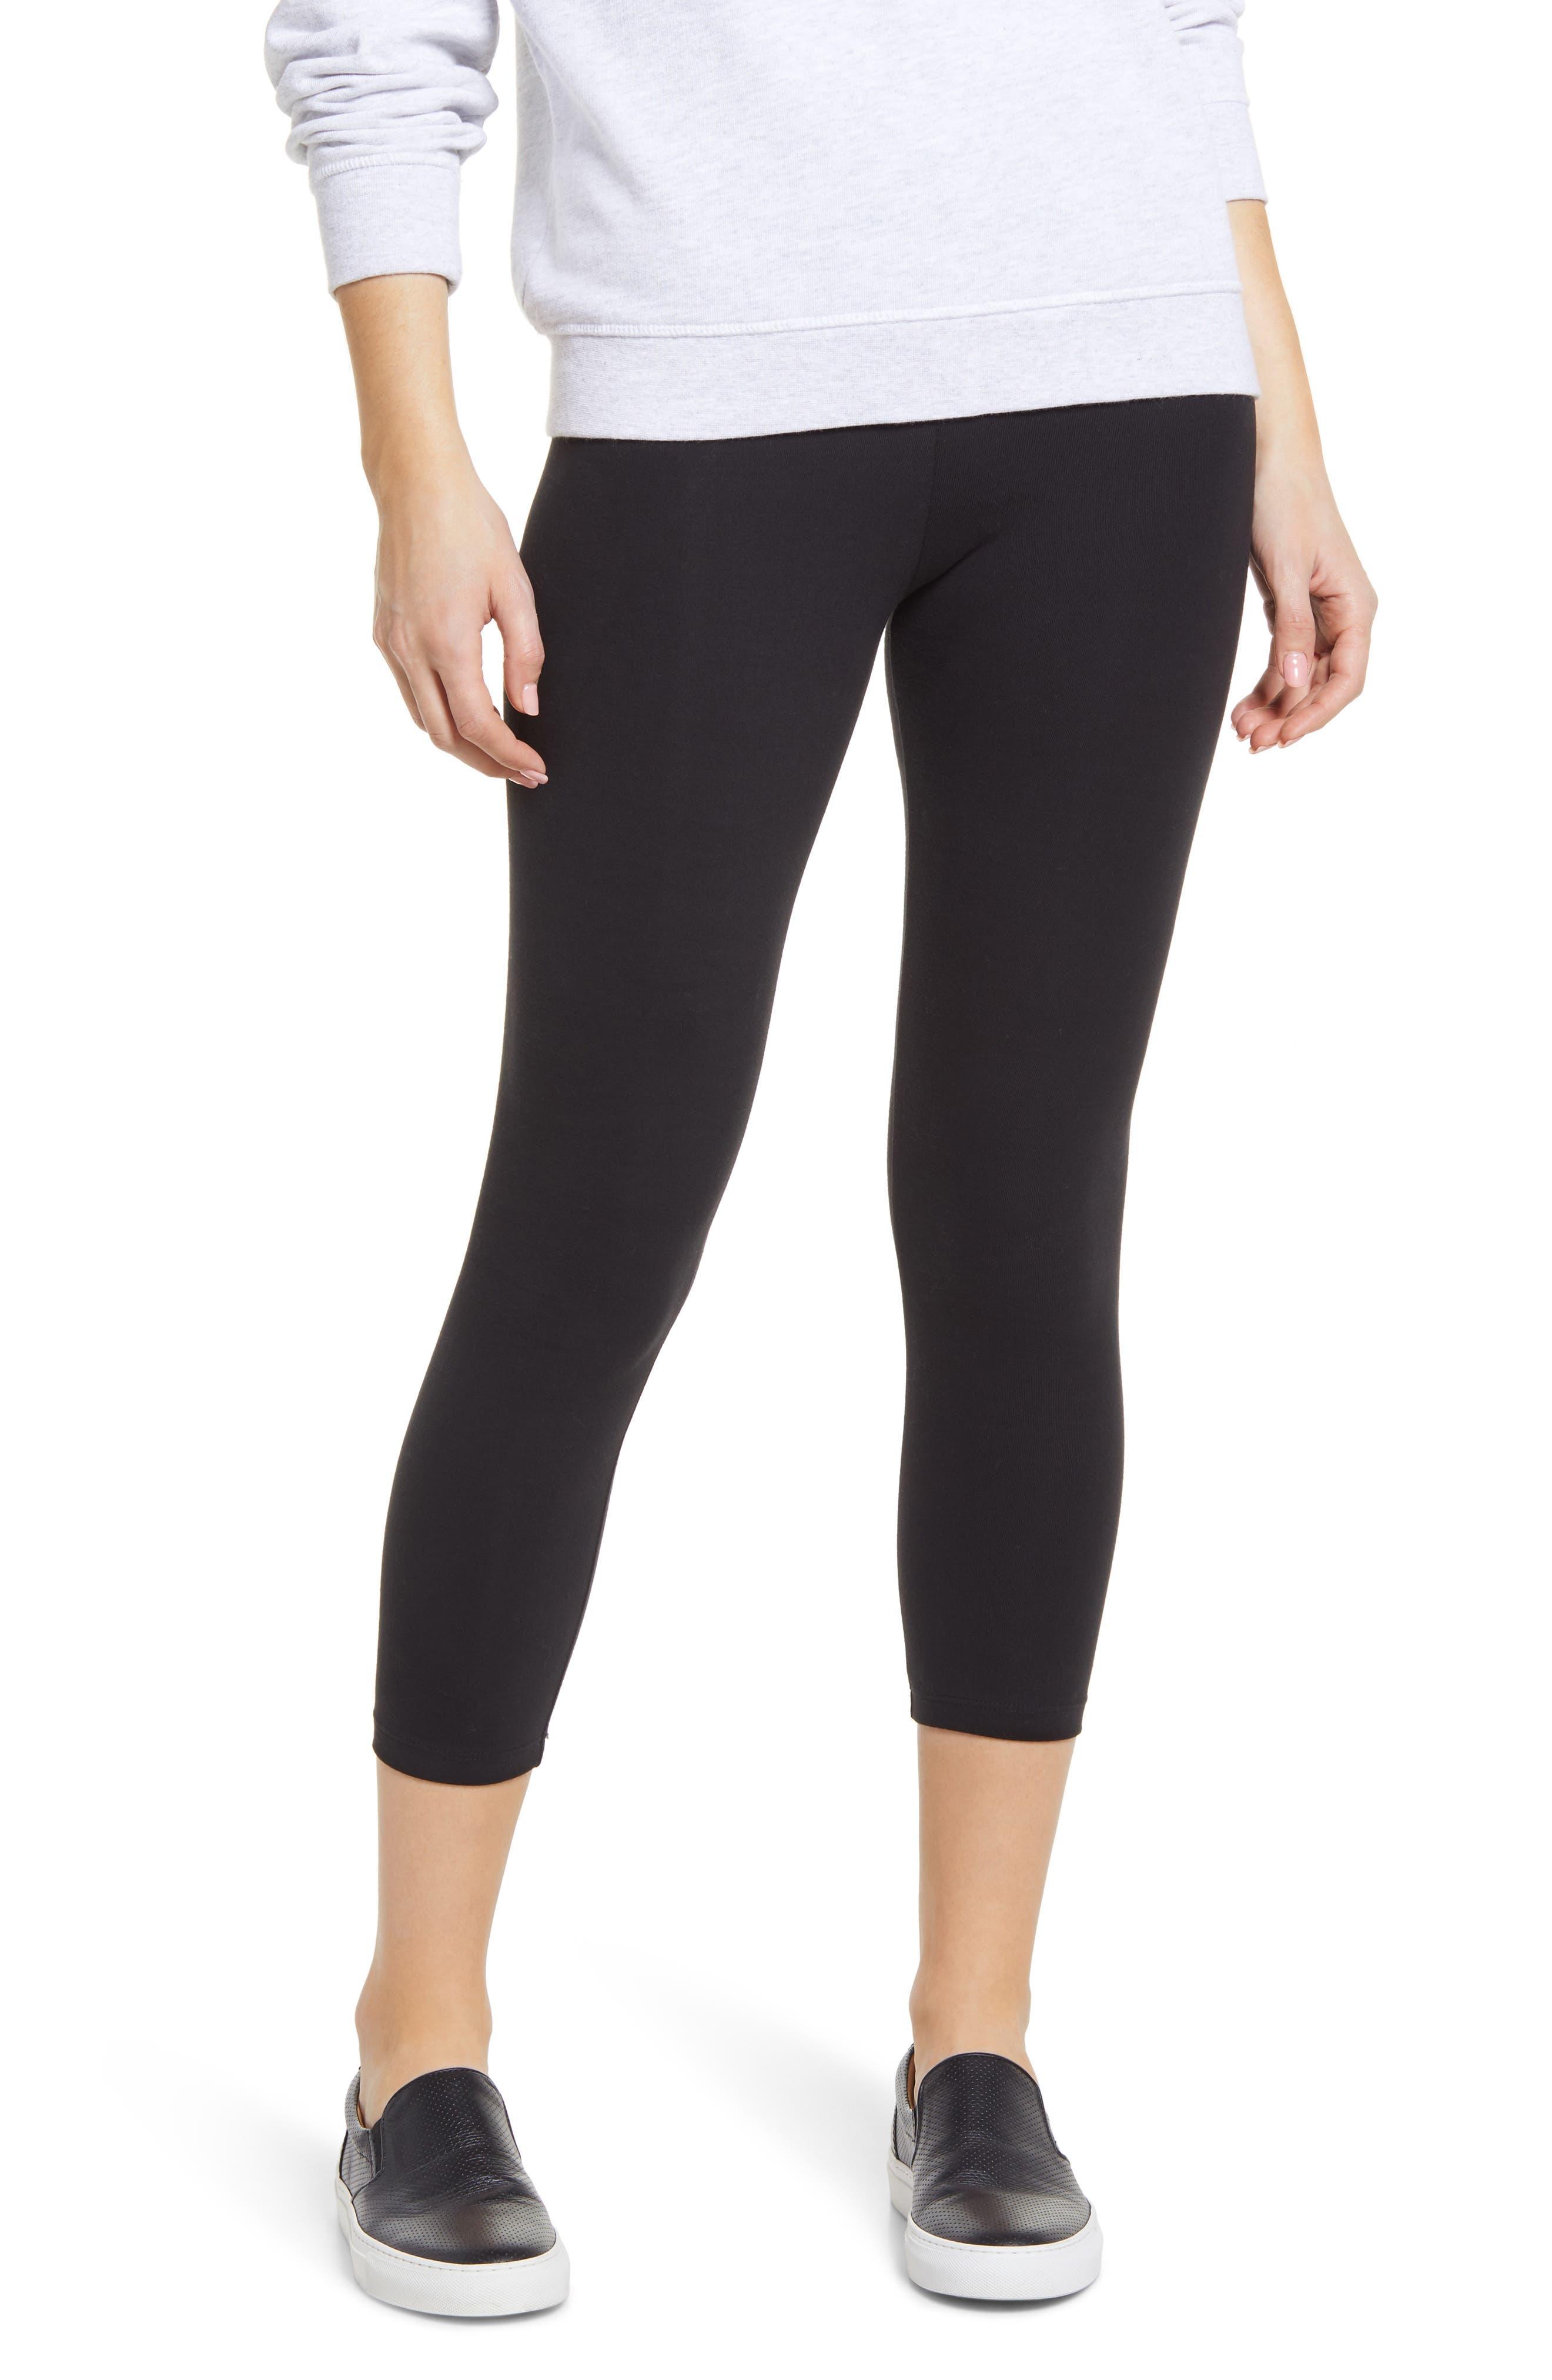 yoga pants high waist joggers funky leggings,cozy sweatpants Geometric Women/'s Joggers